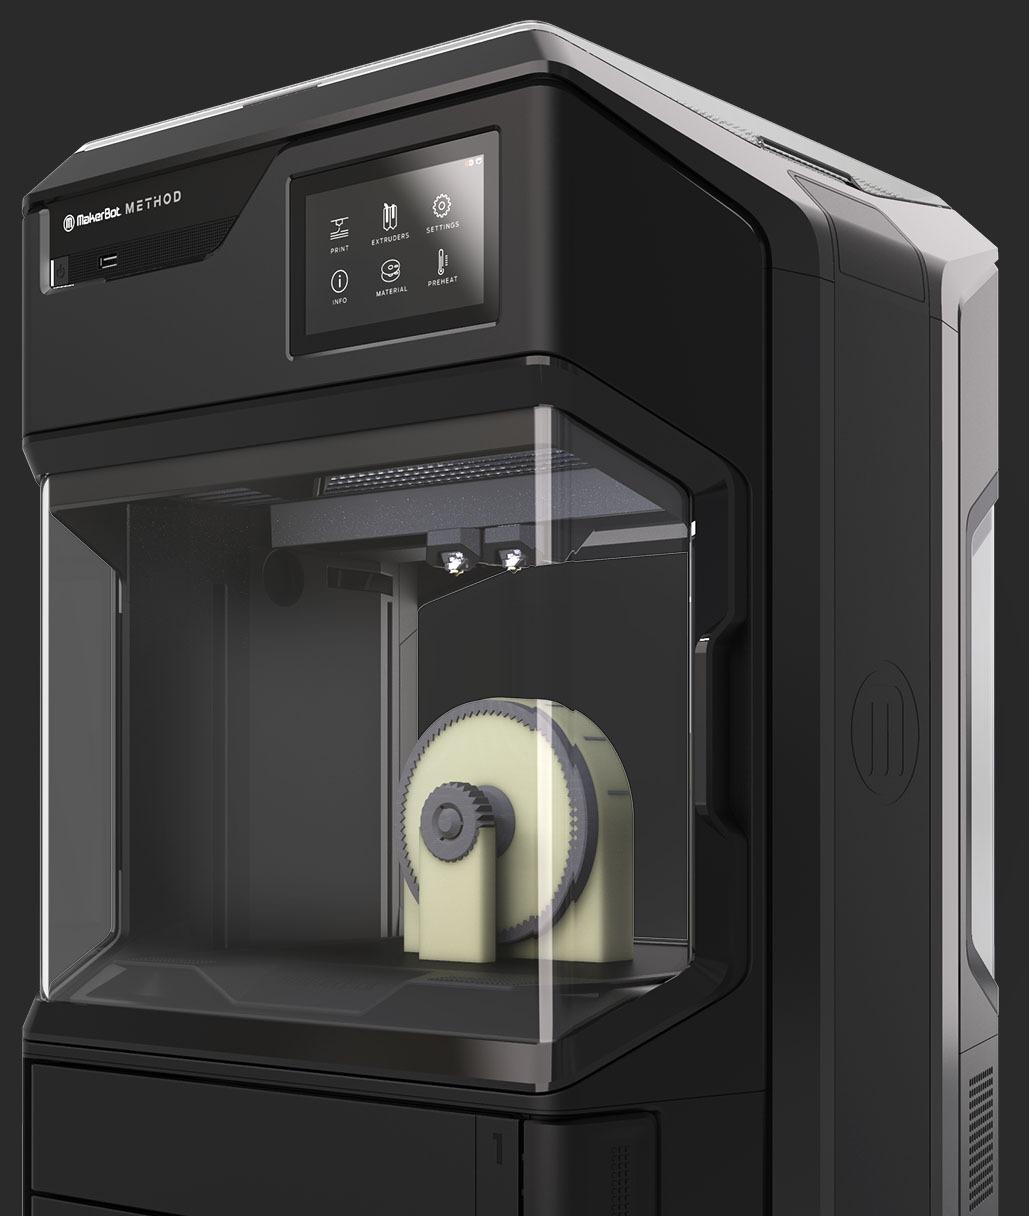 Les imprimantes 3D MakerBot Method compatibles avec le BASF Forward AM Ultrafuse 316L